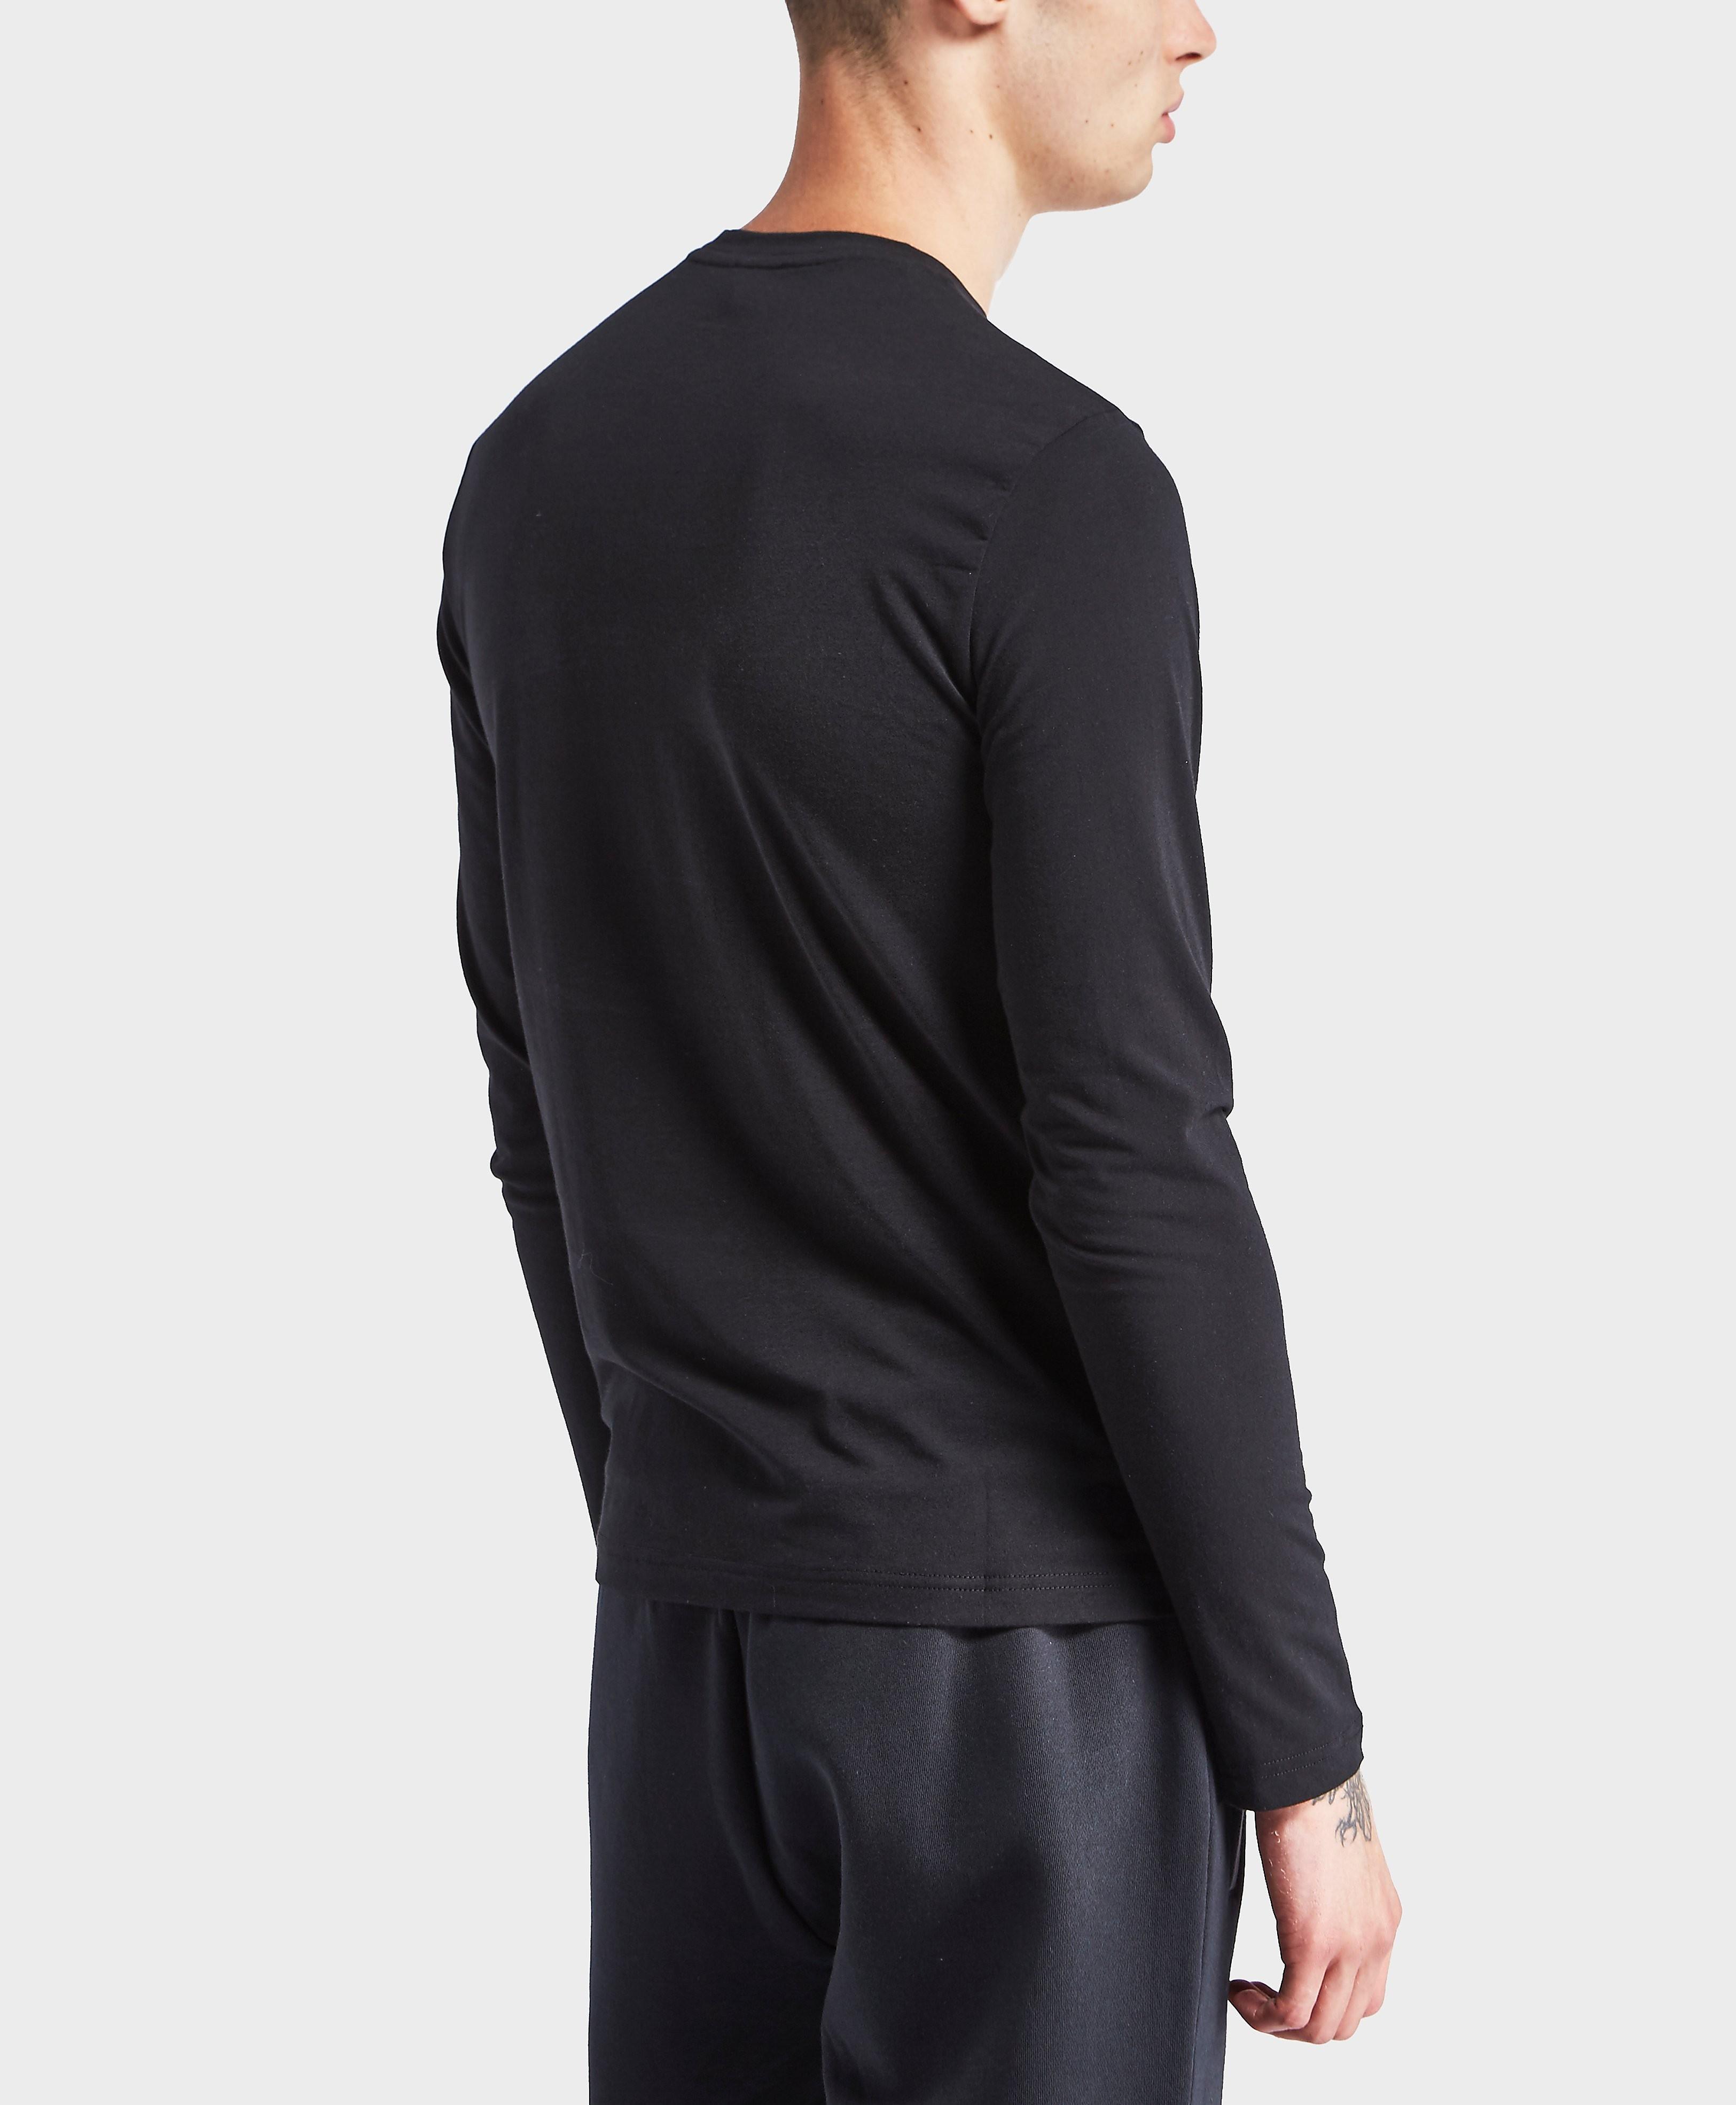 Emporio Armani EA7 Shield Logo Long Sleeve T-Shirt - Exclusive